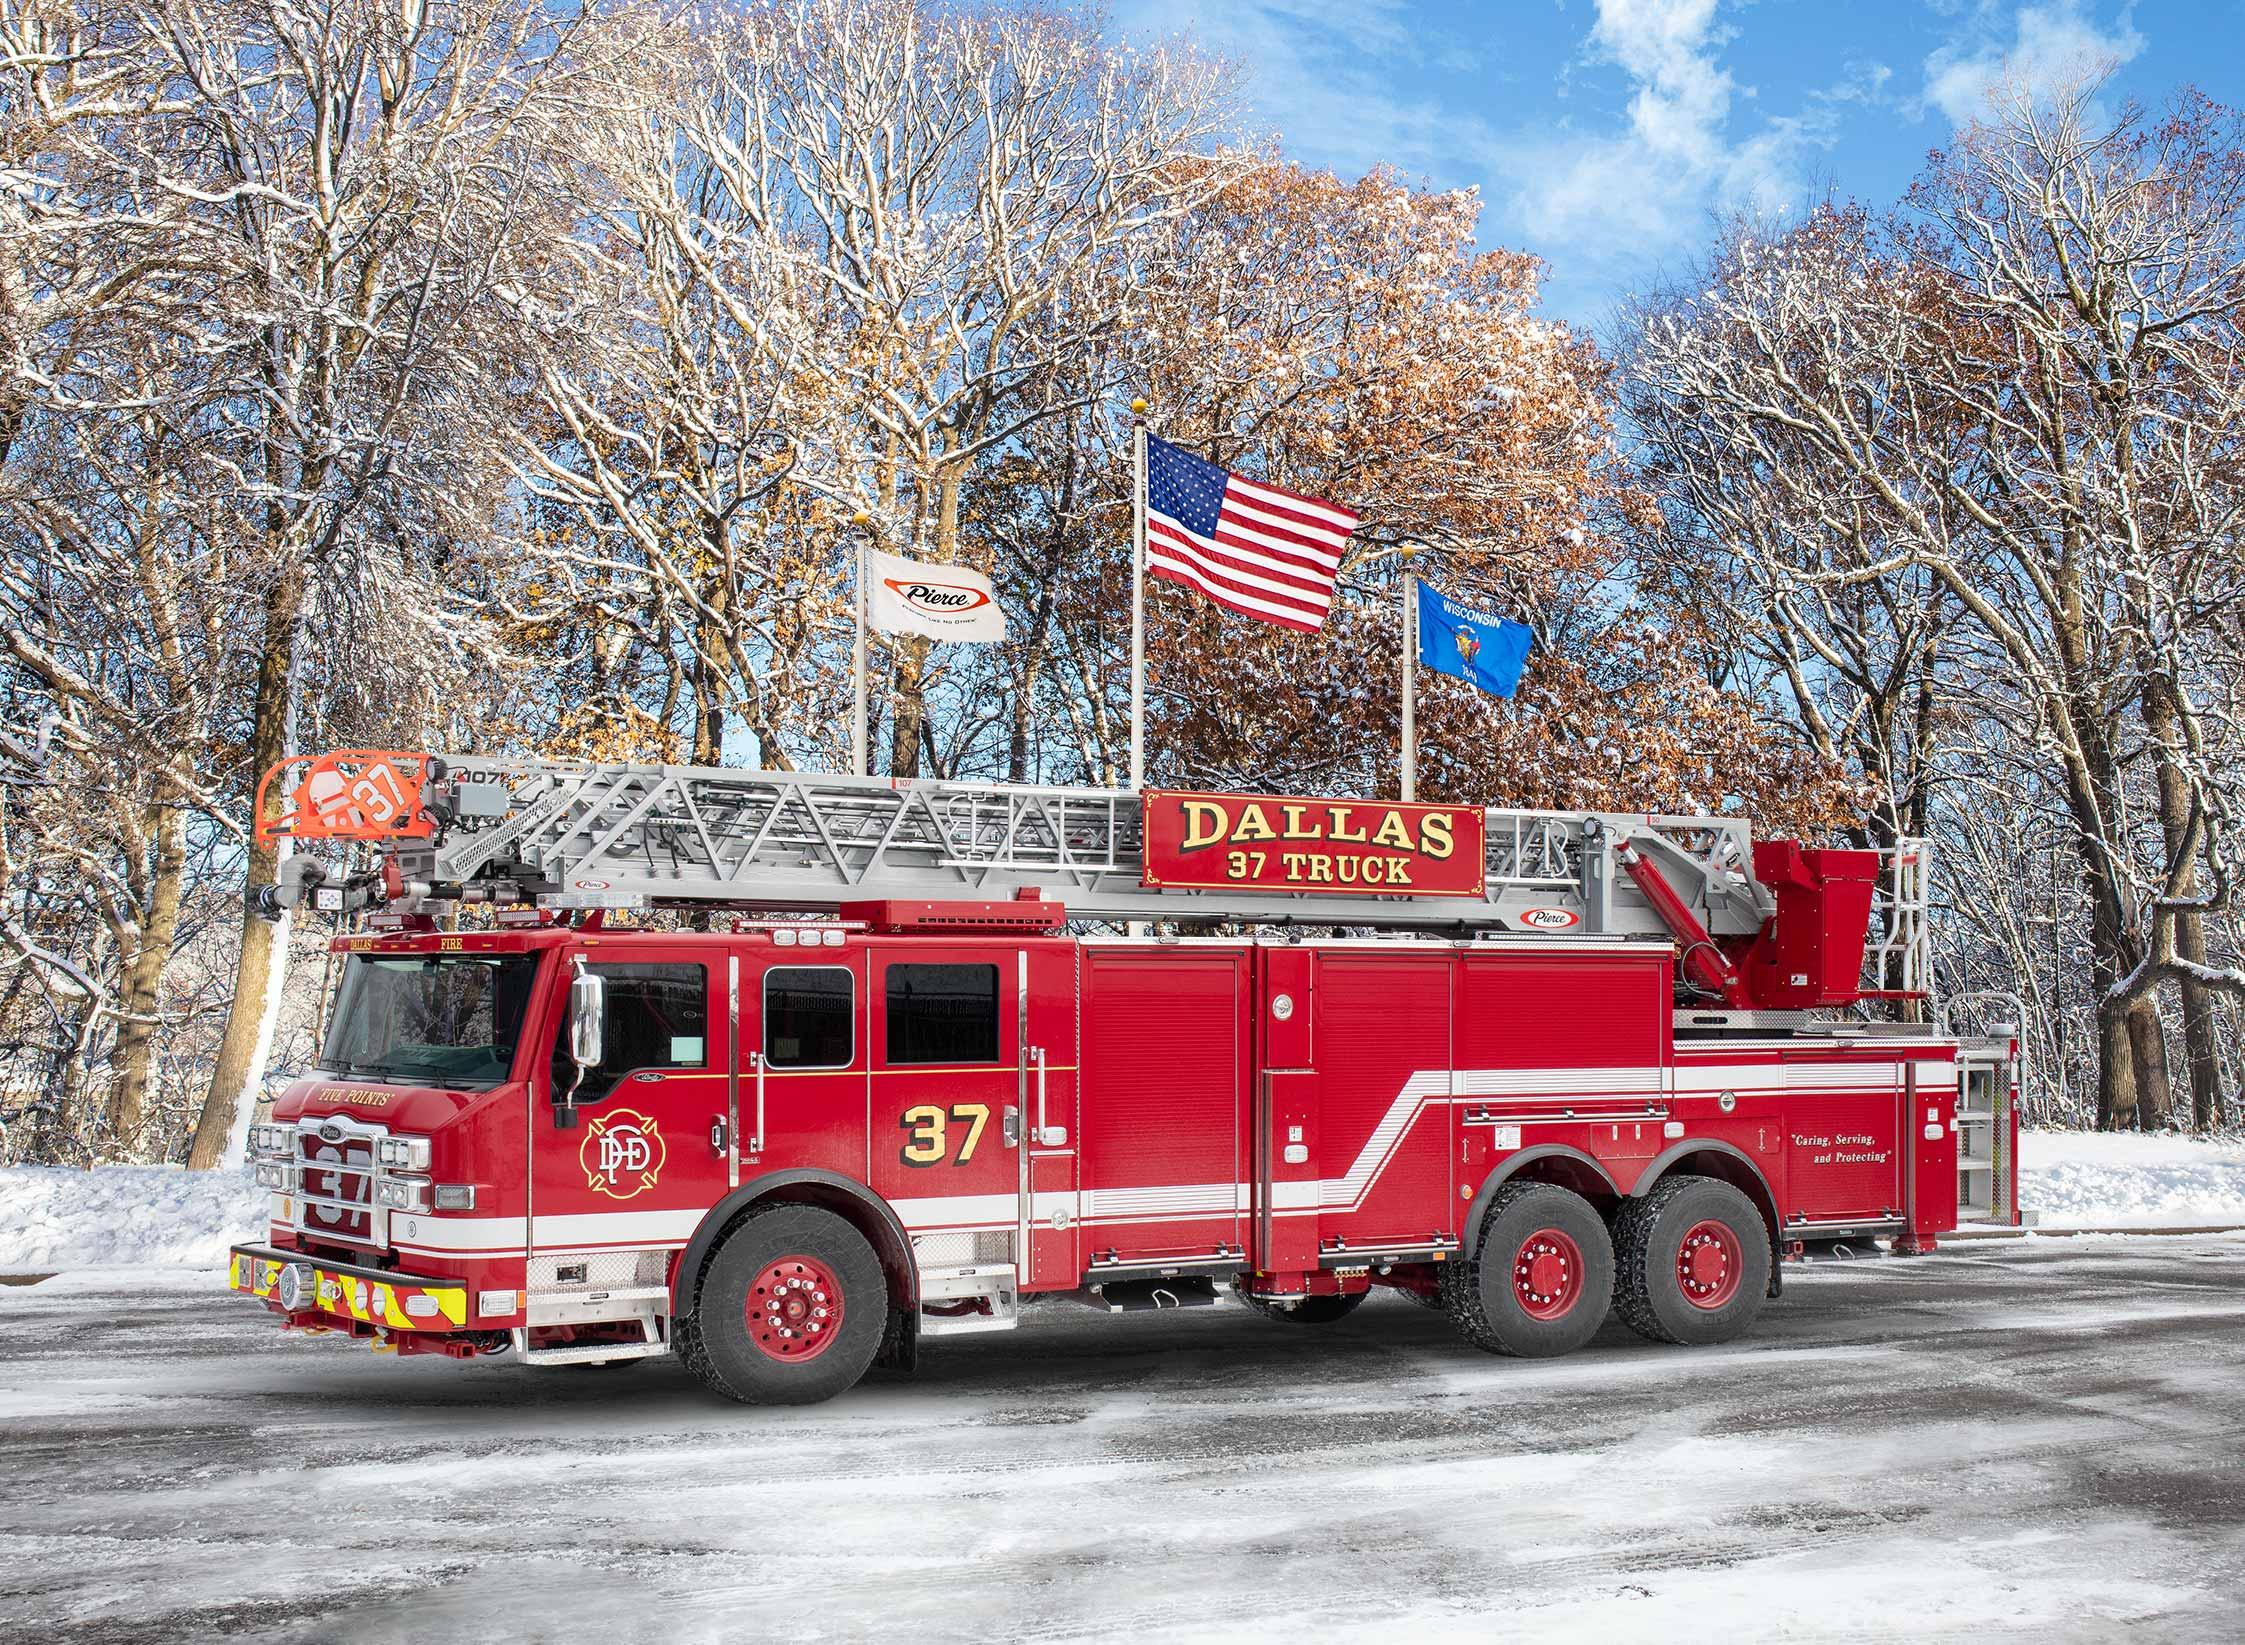 Dallas Fire Department - Aerial